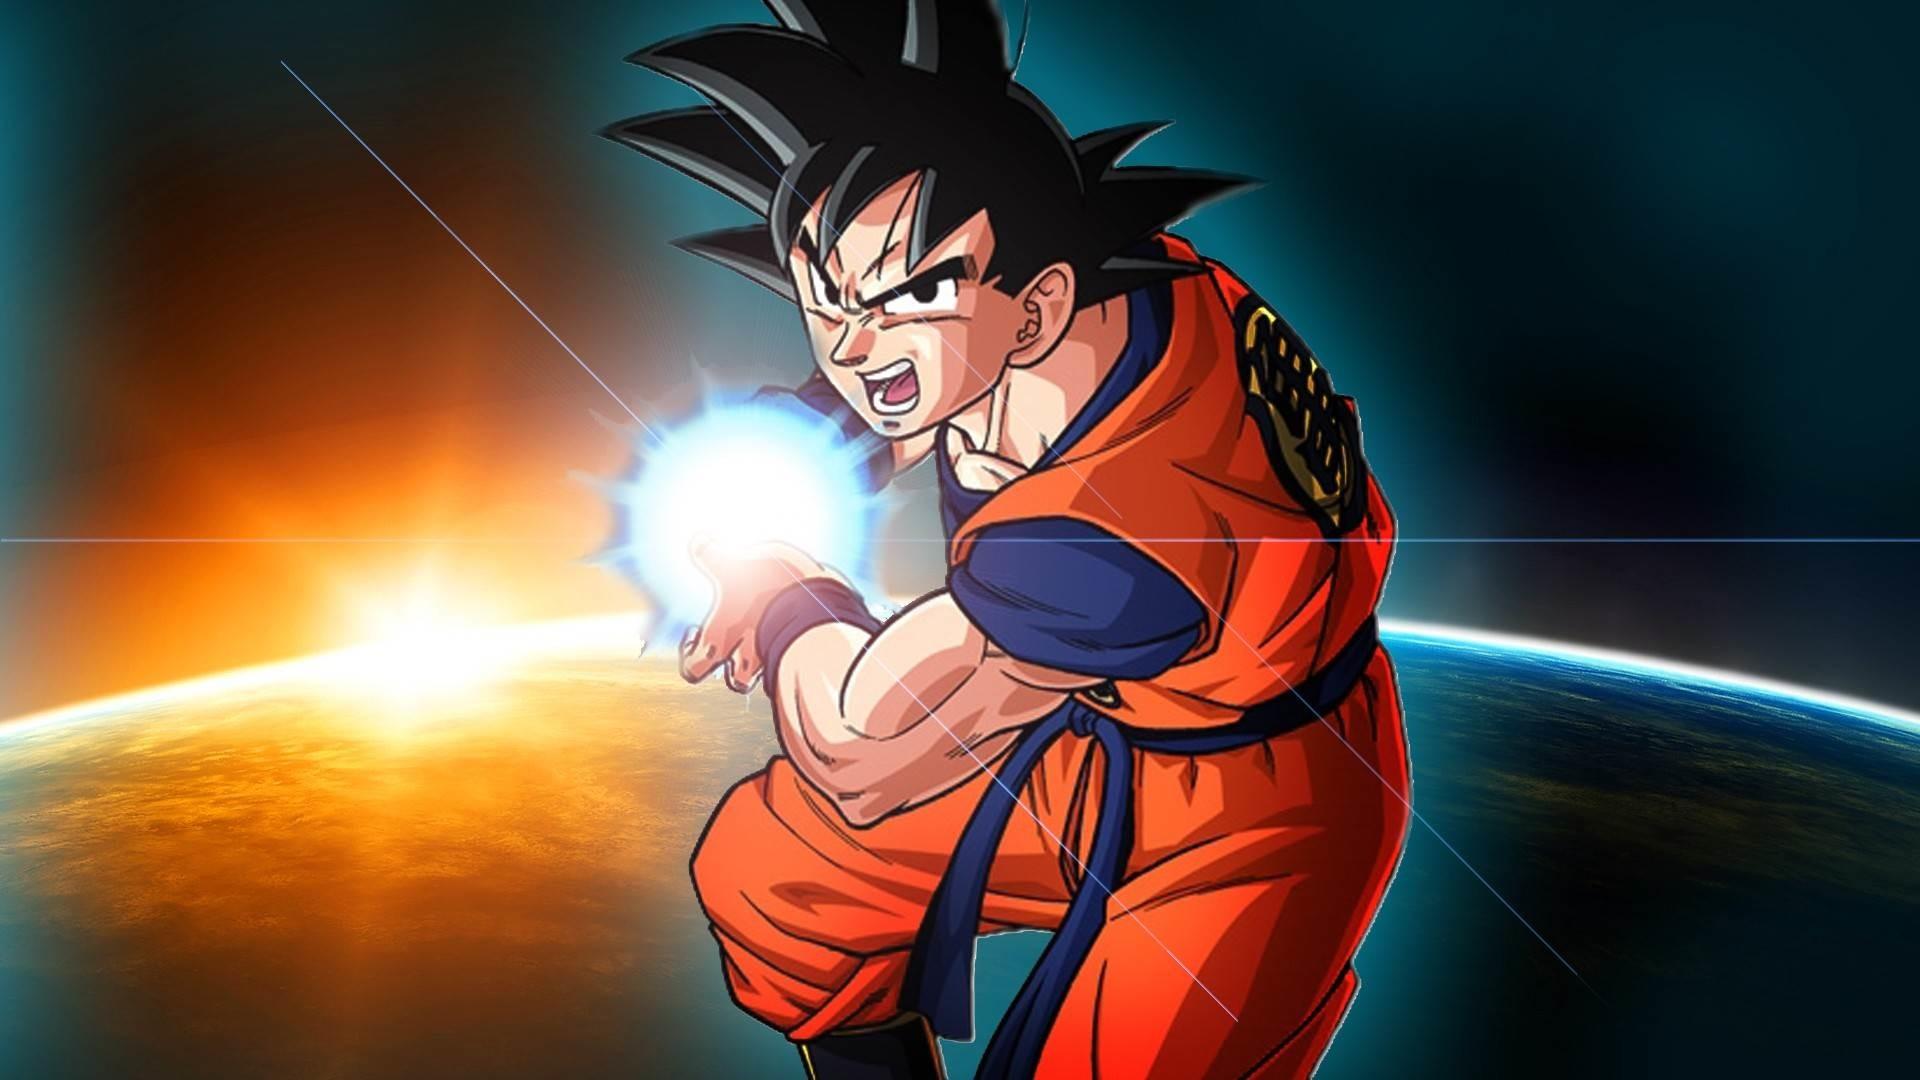 Dragonball GT Goku Super Saiyan Wallpaper by BlackShadowX 1920×1080 Goku  Super Saiyan 4 HD